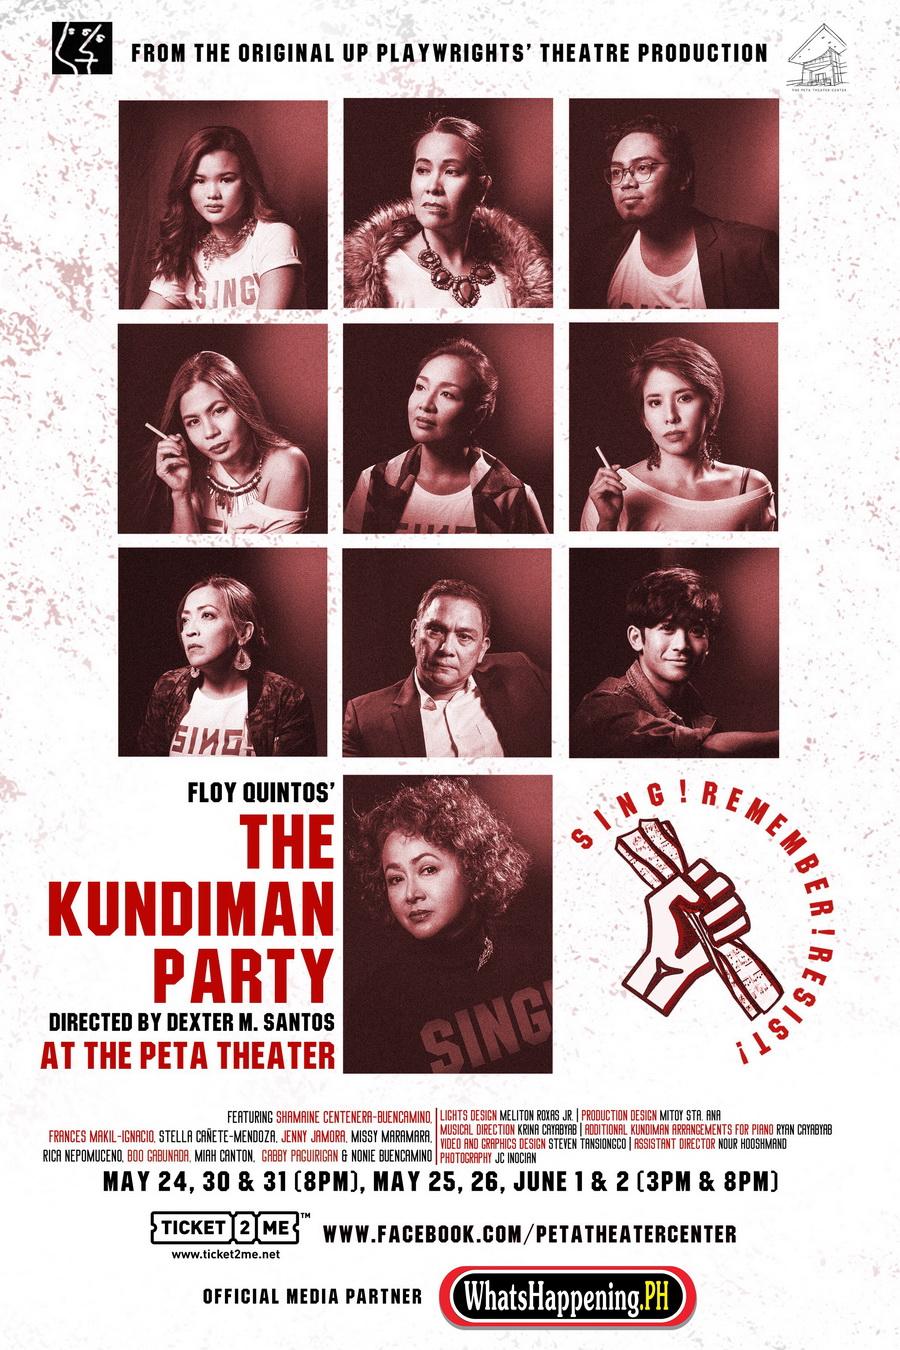 The Kundiman Party